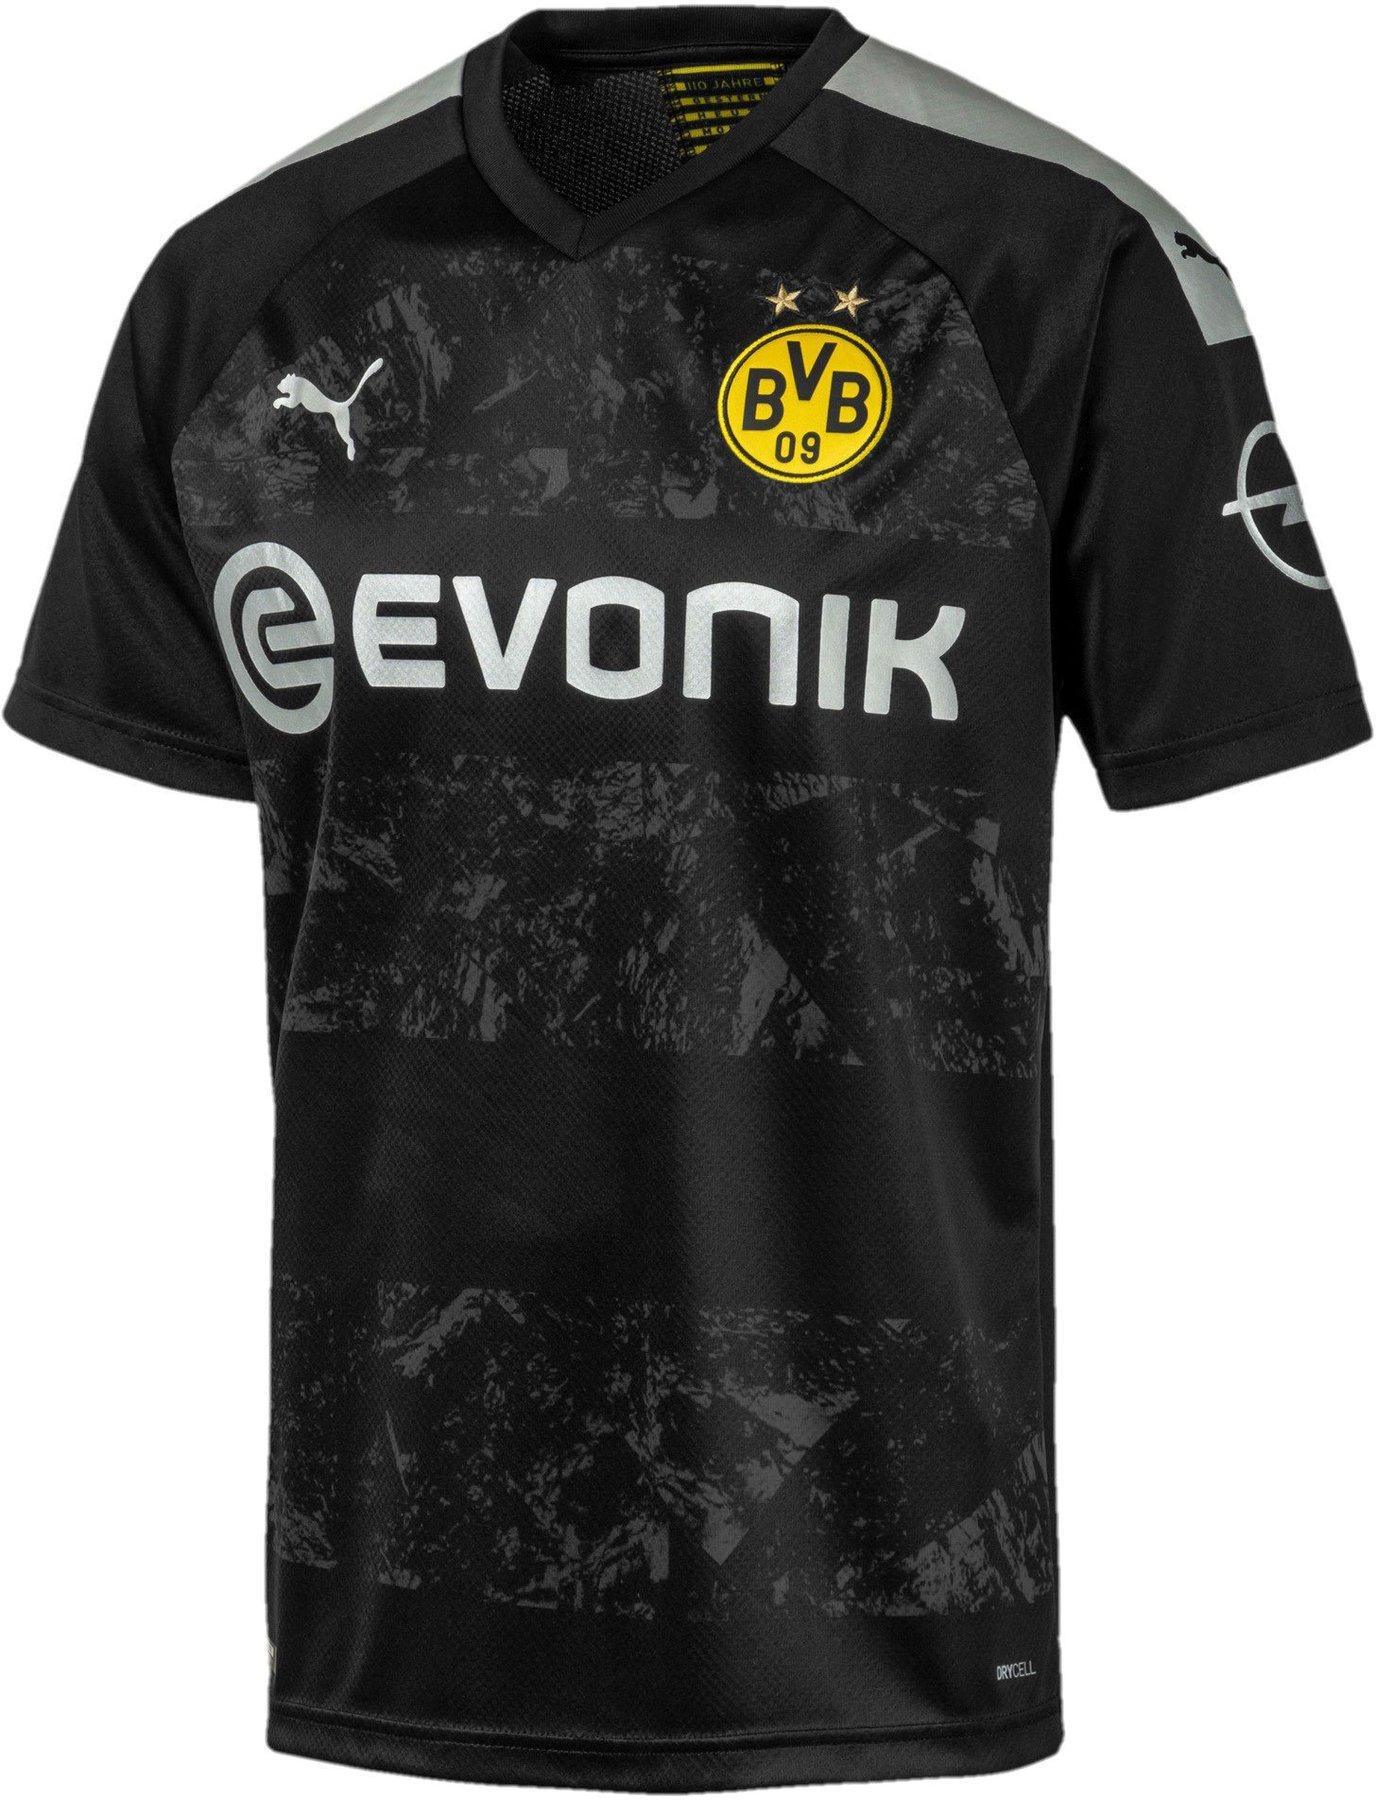 Puma Borussia Dortmund Away Trikot 2020 günstig kaufen